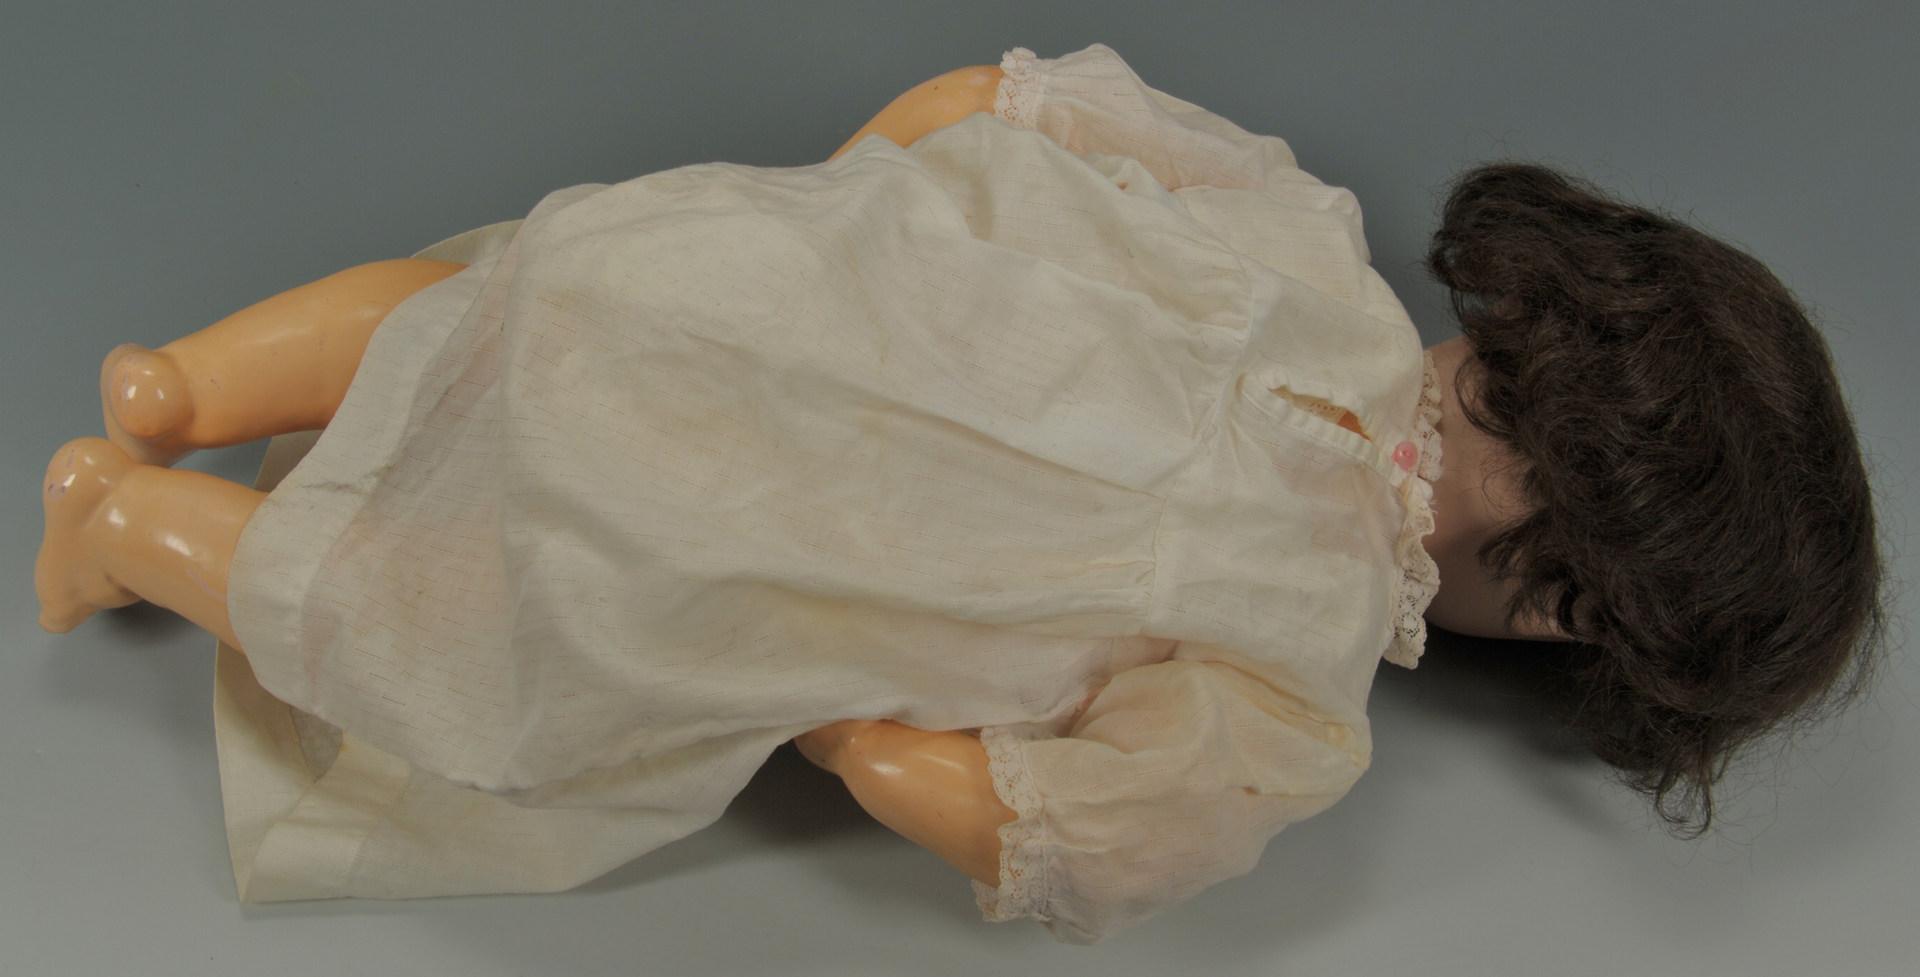 Lot 580: Simon & Halbig/Kammer & Reinhardt Bisque Doll